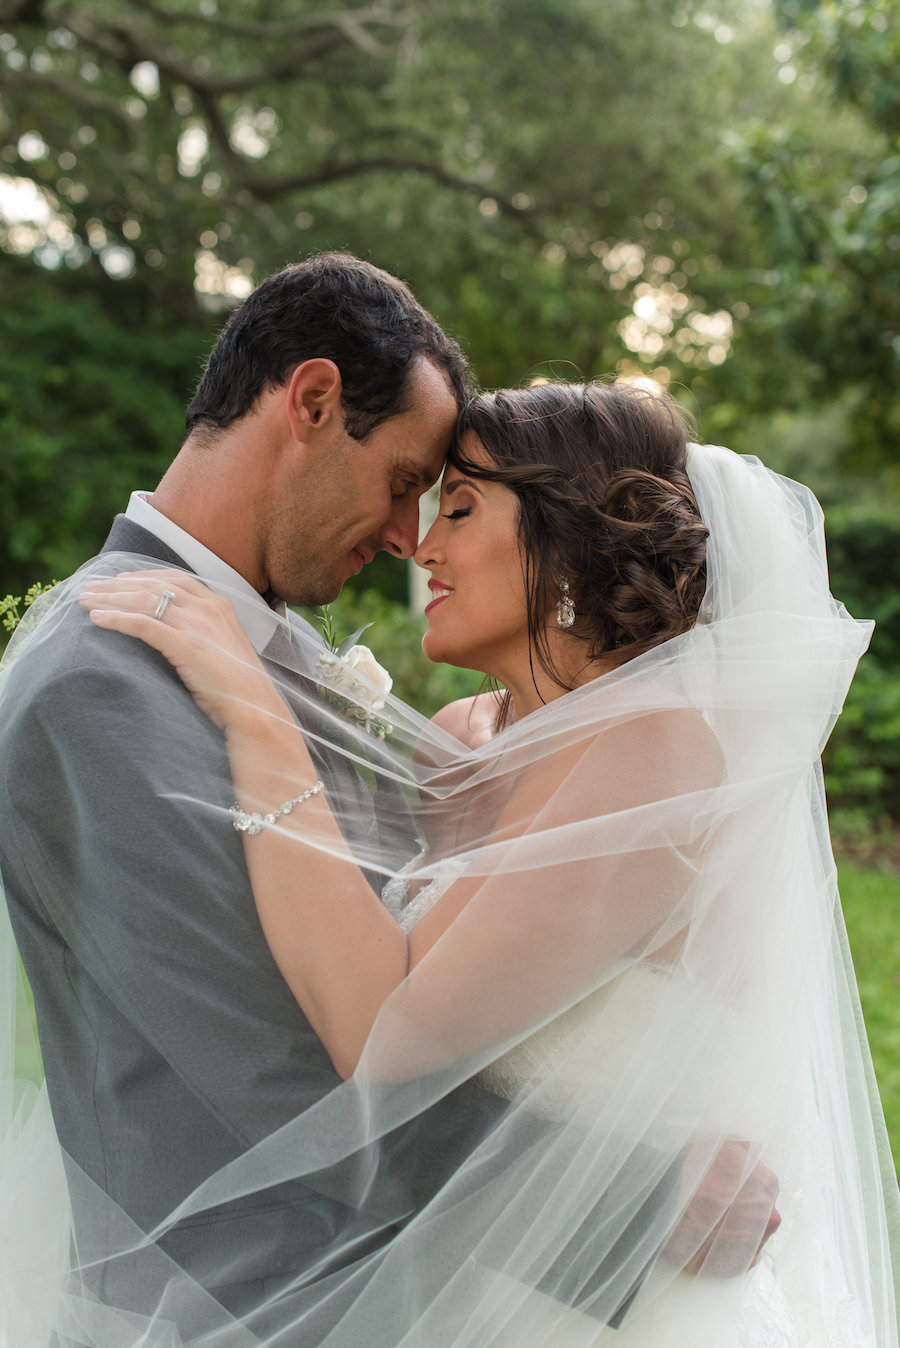 Outdoor Garden Ceremony Portrait by Tampa Bay Wedding Photographer Caroline & Evan Photography